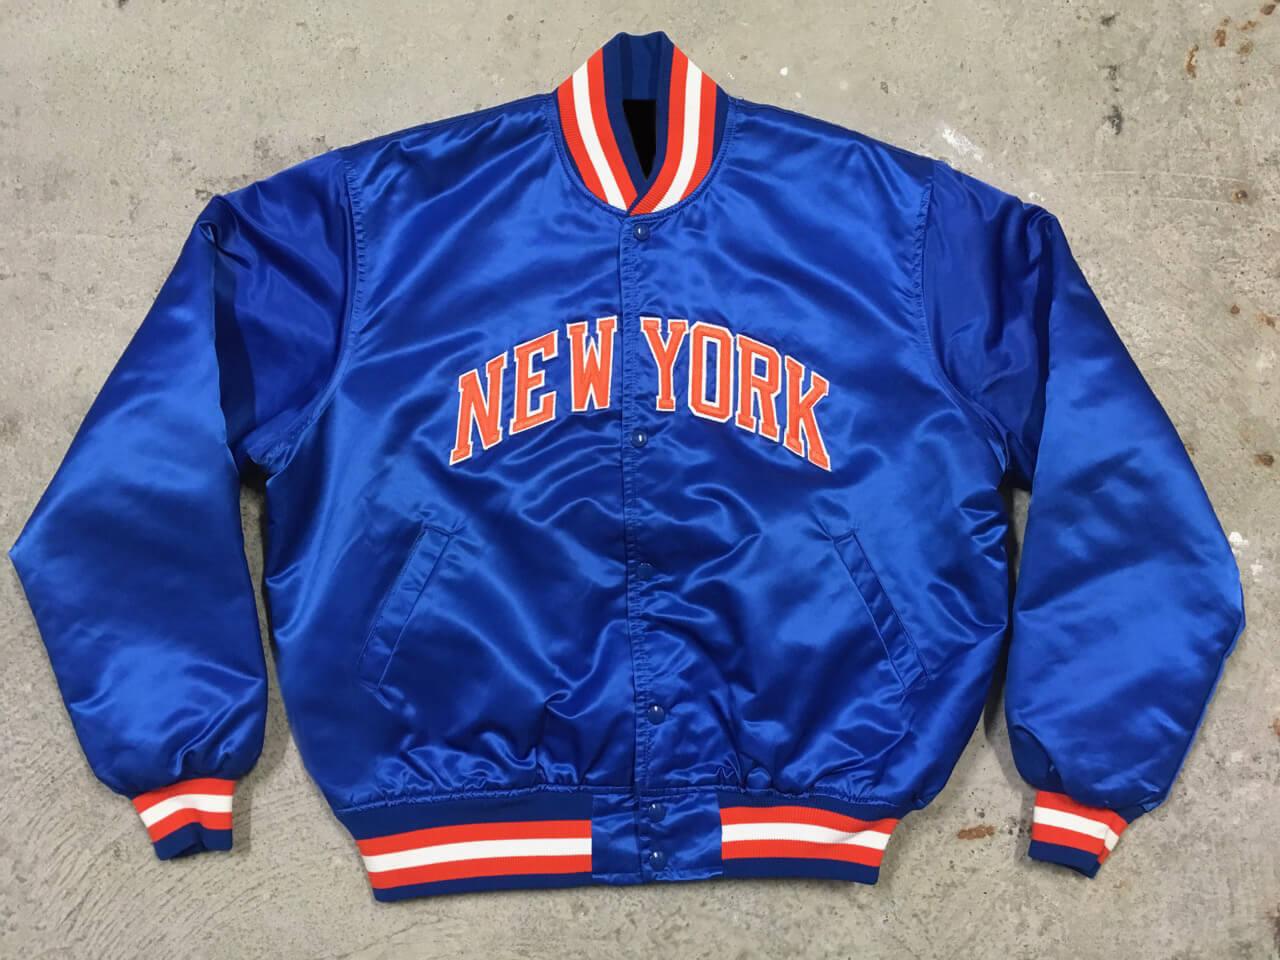 Vintage 90s Baseball New York Knicks Satin Jacket